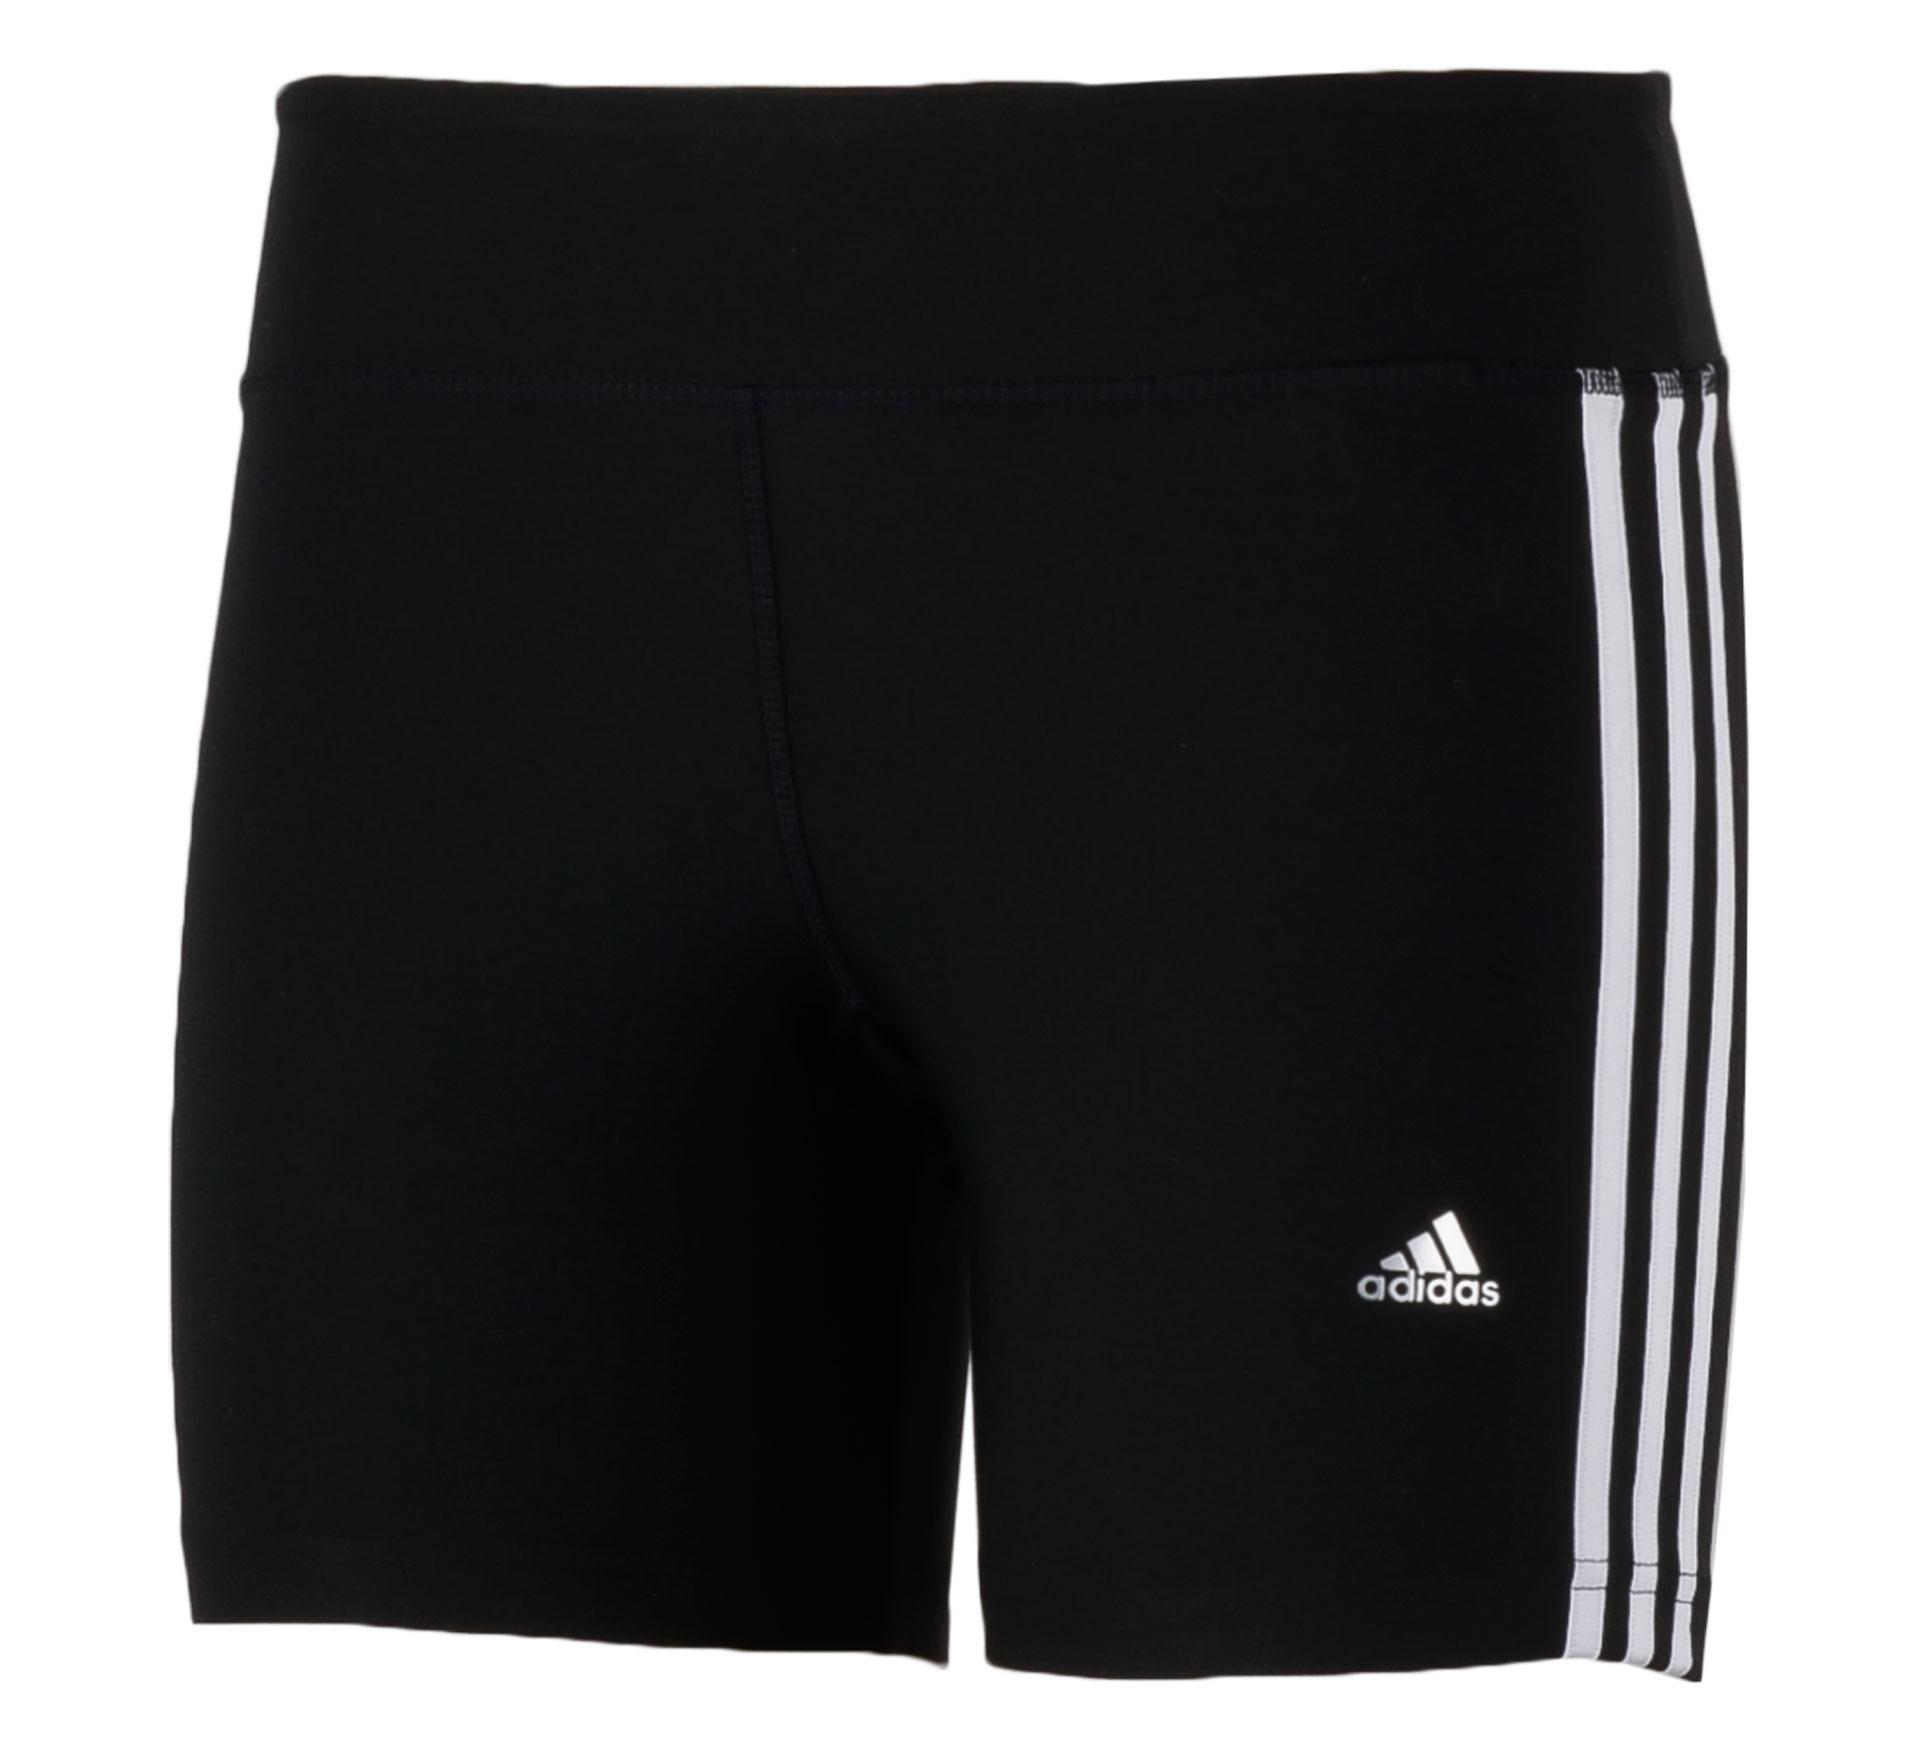 Adidas Ultimate Fit 3Stripe Short Dames zwart - wit